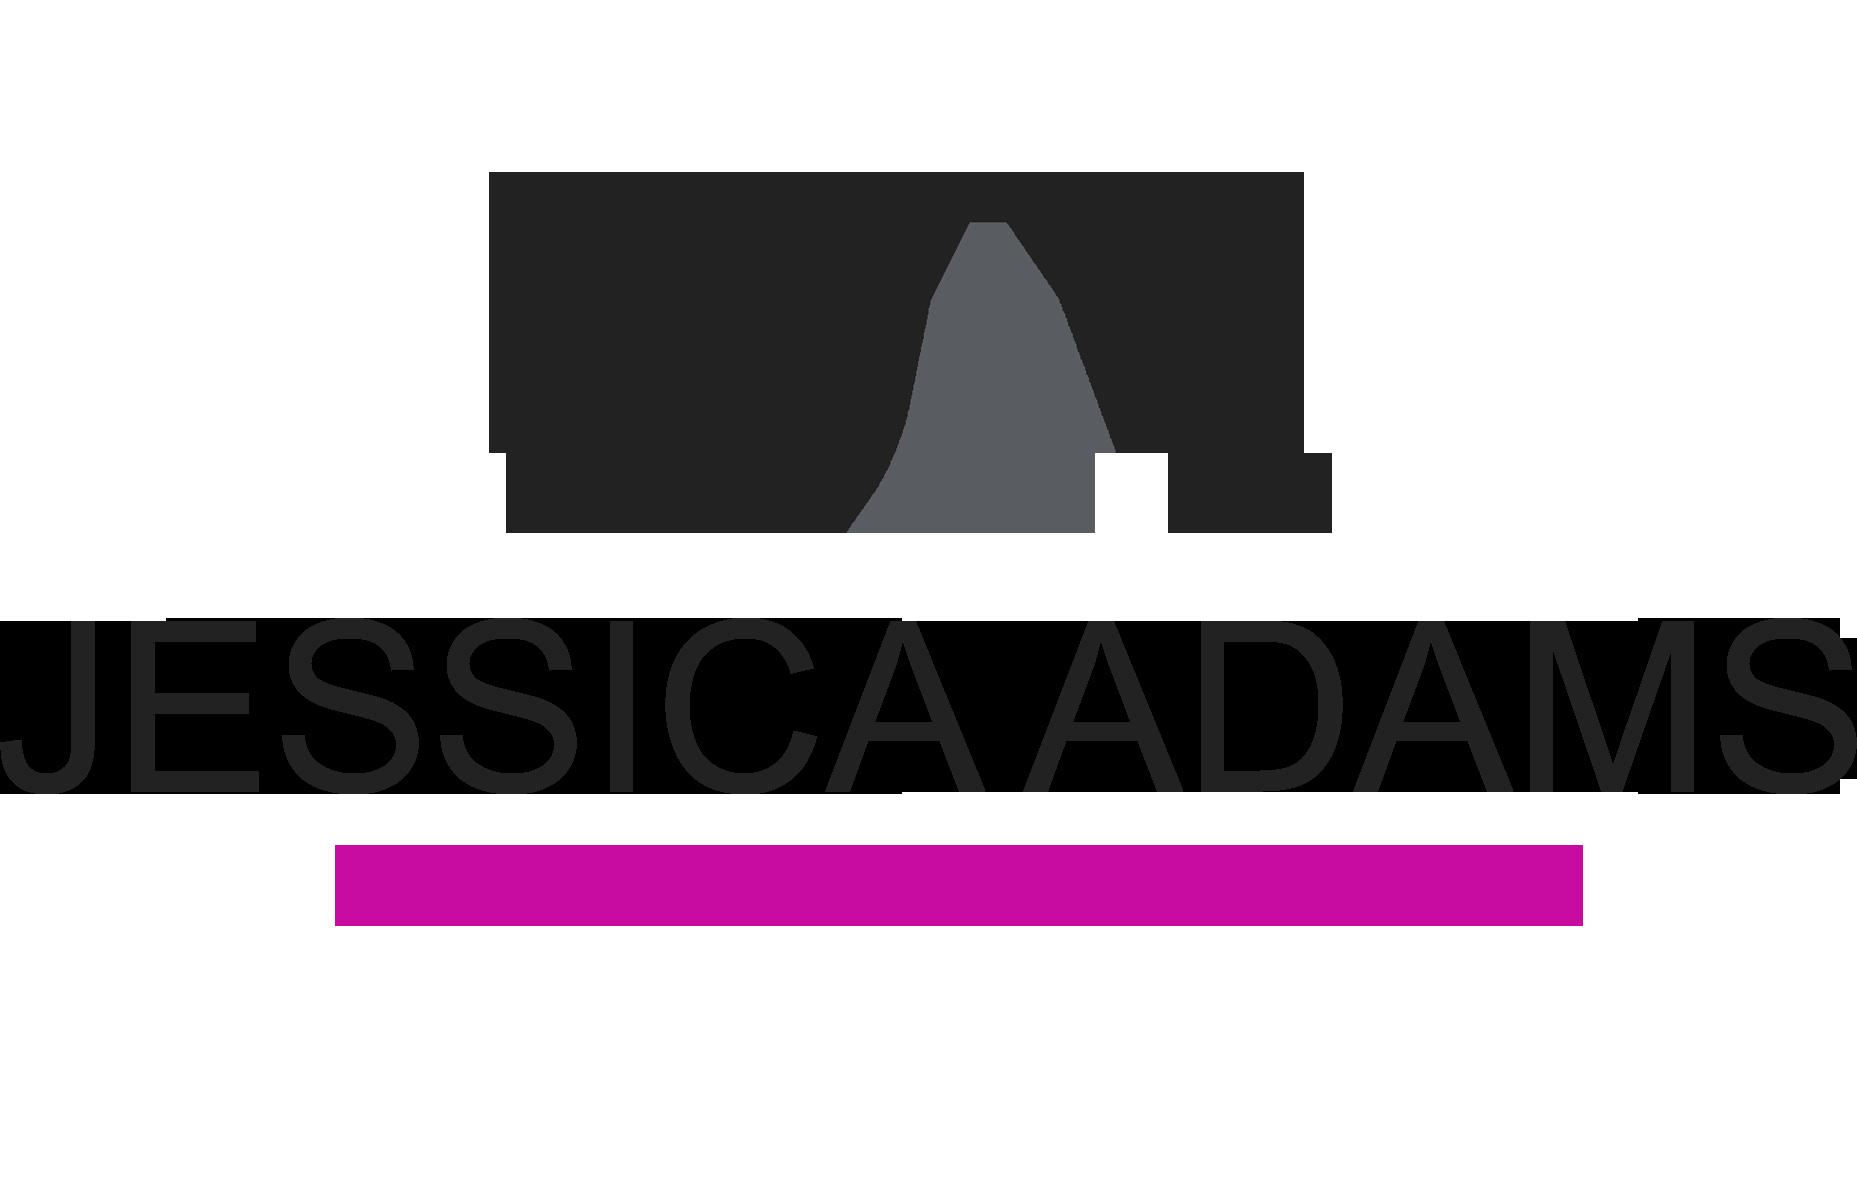 Jessica Adams Group logo